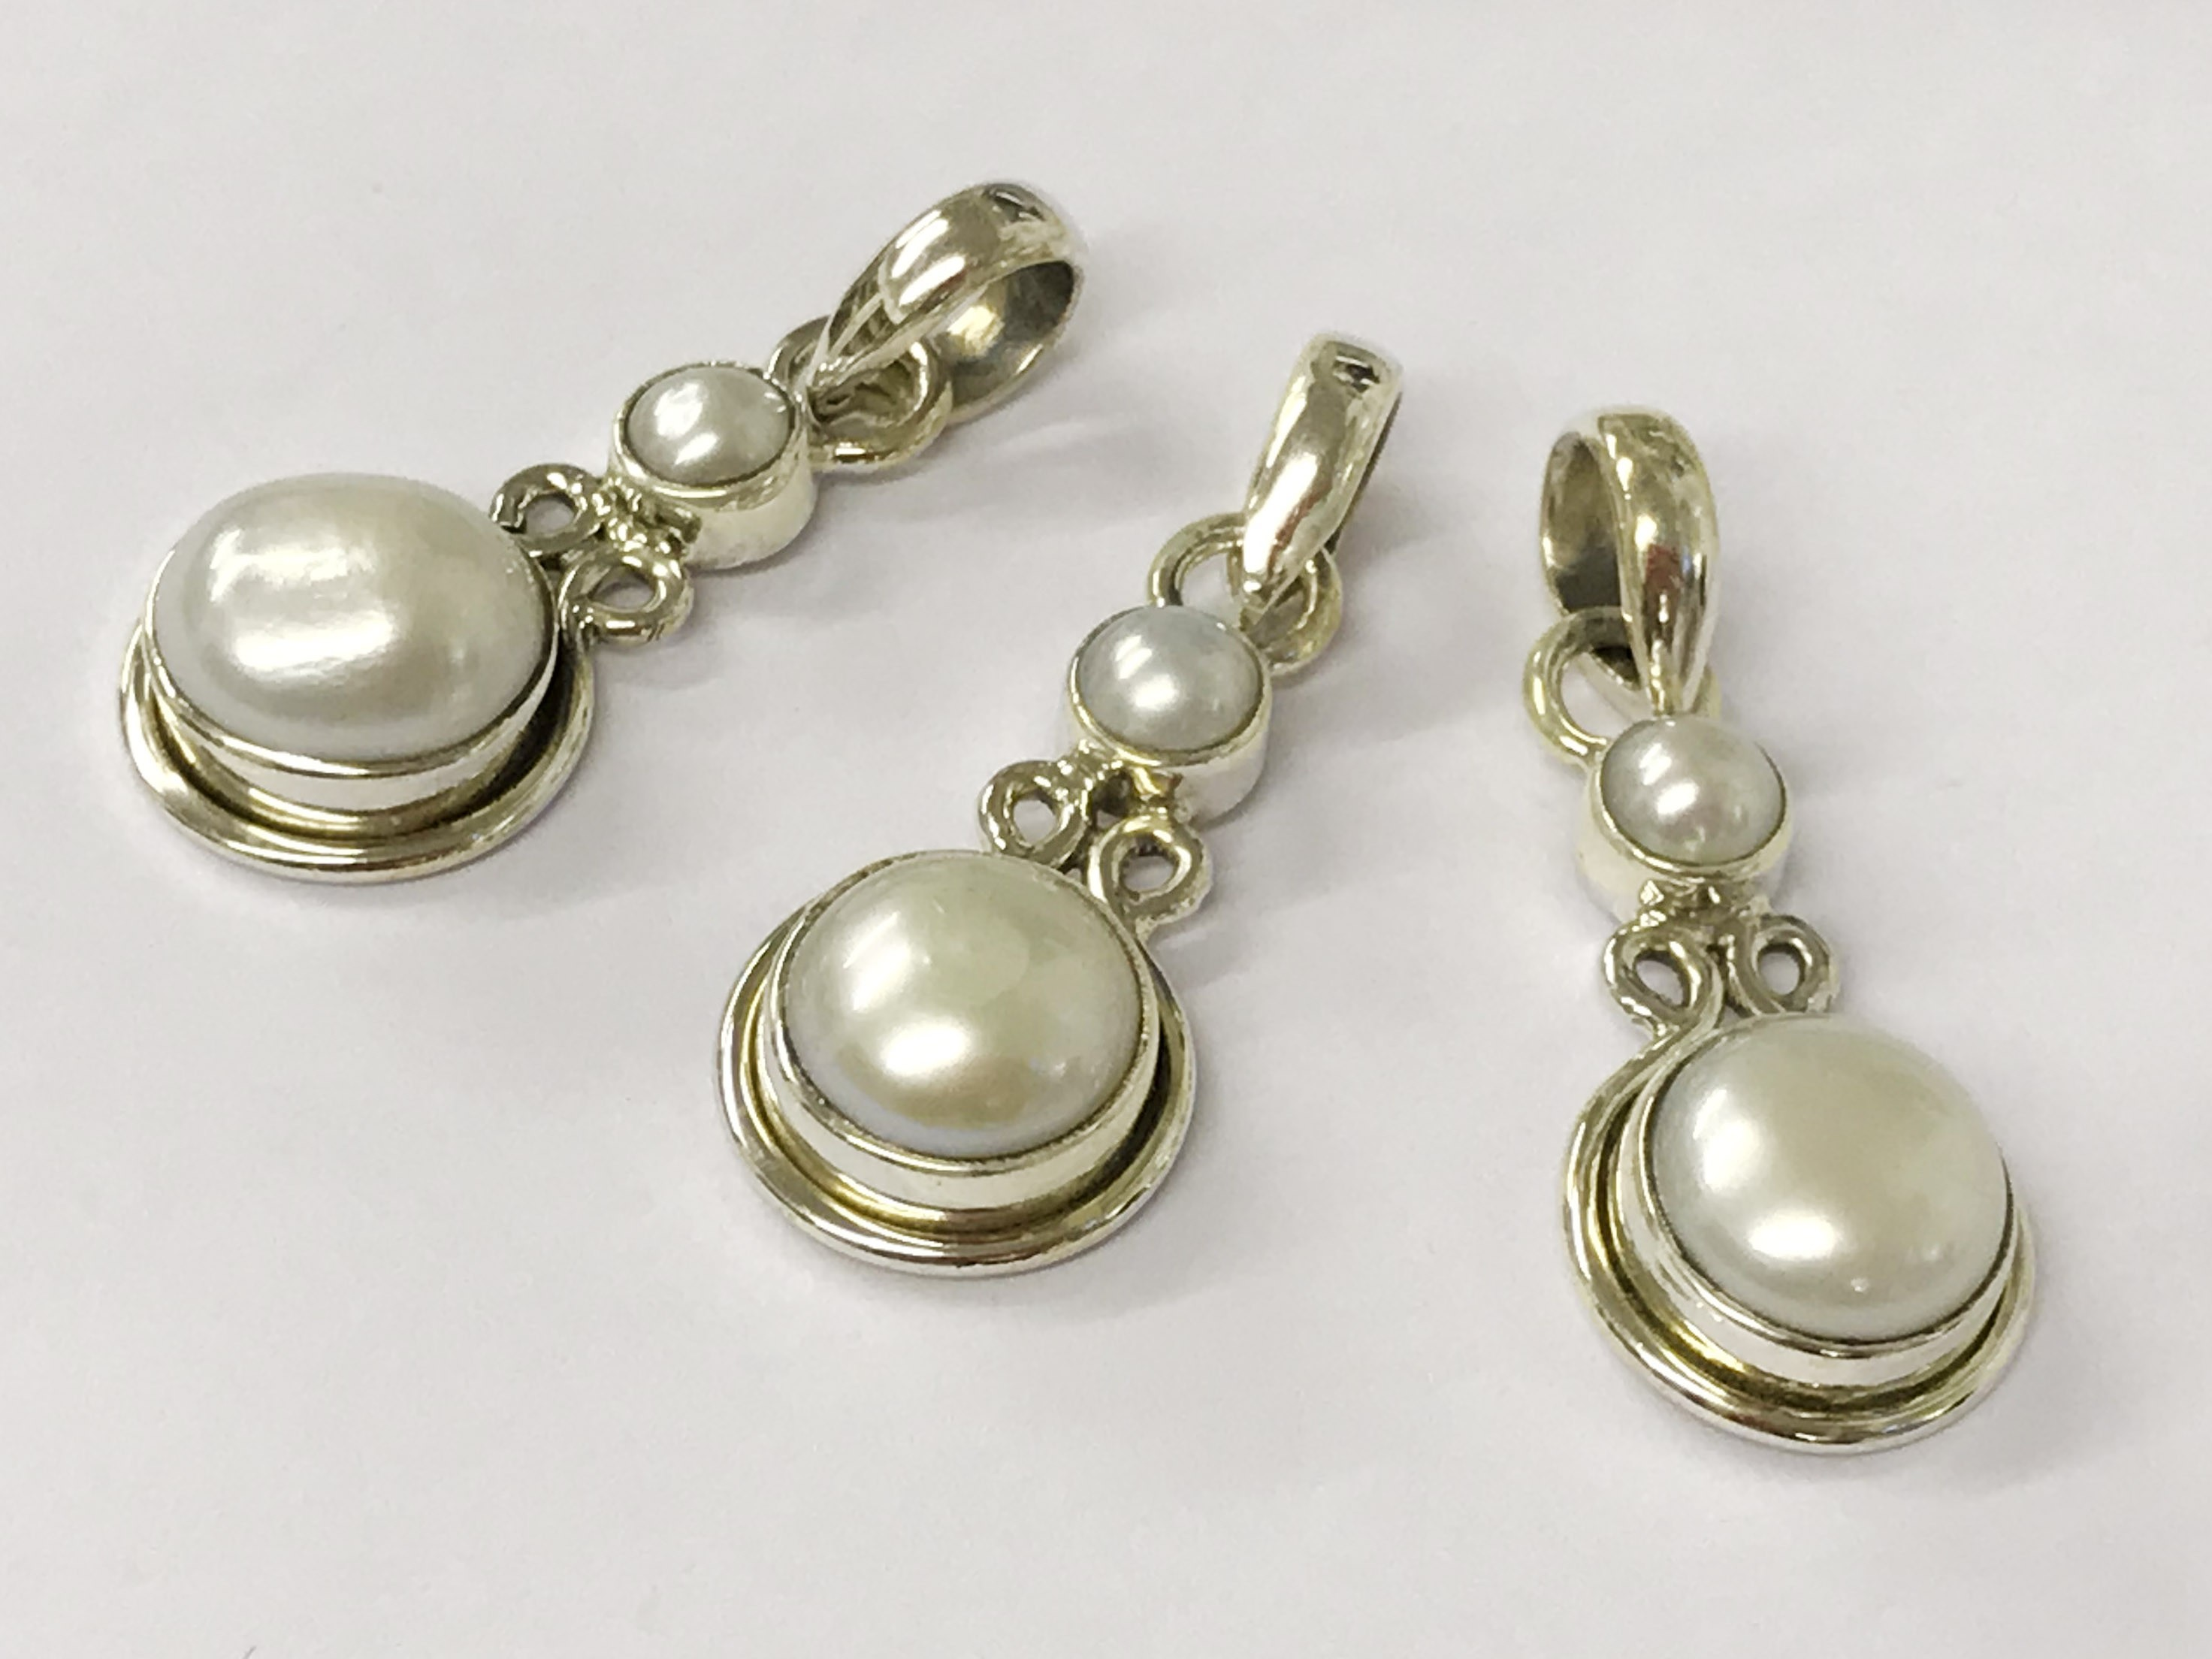 Lot 34 - X3 sterling silver south sea pearl pendants